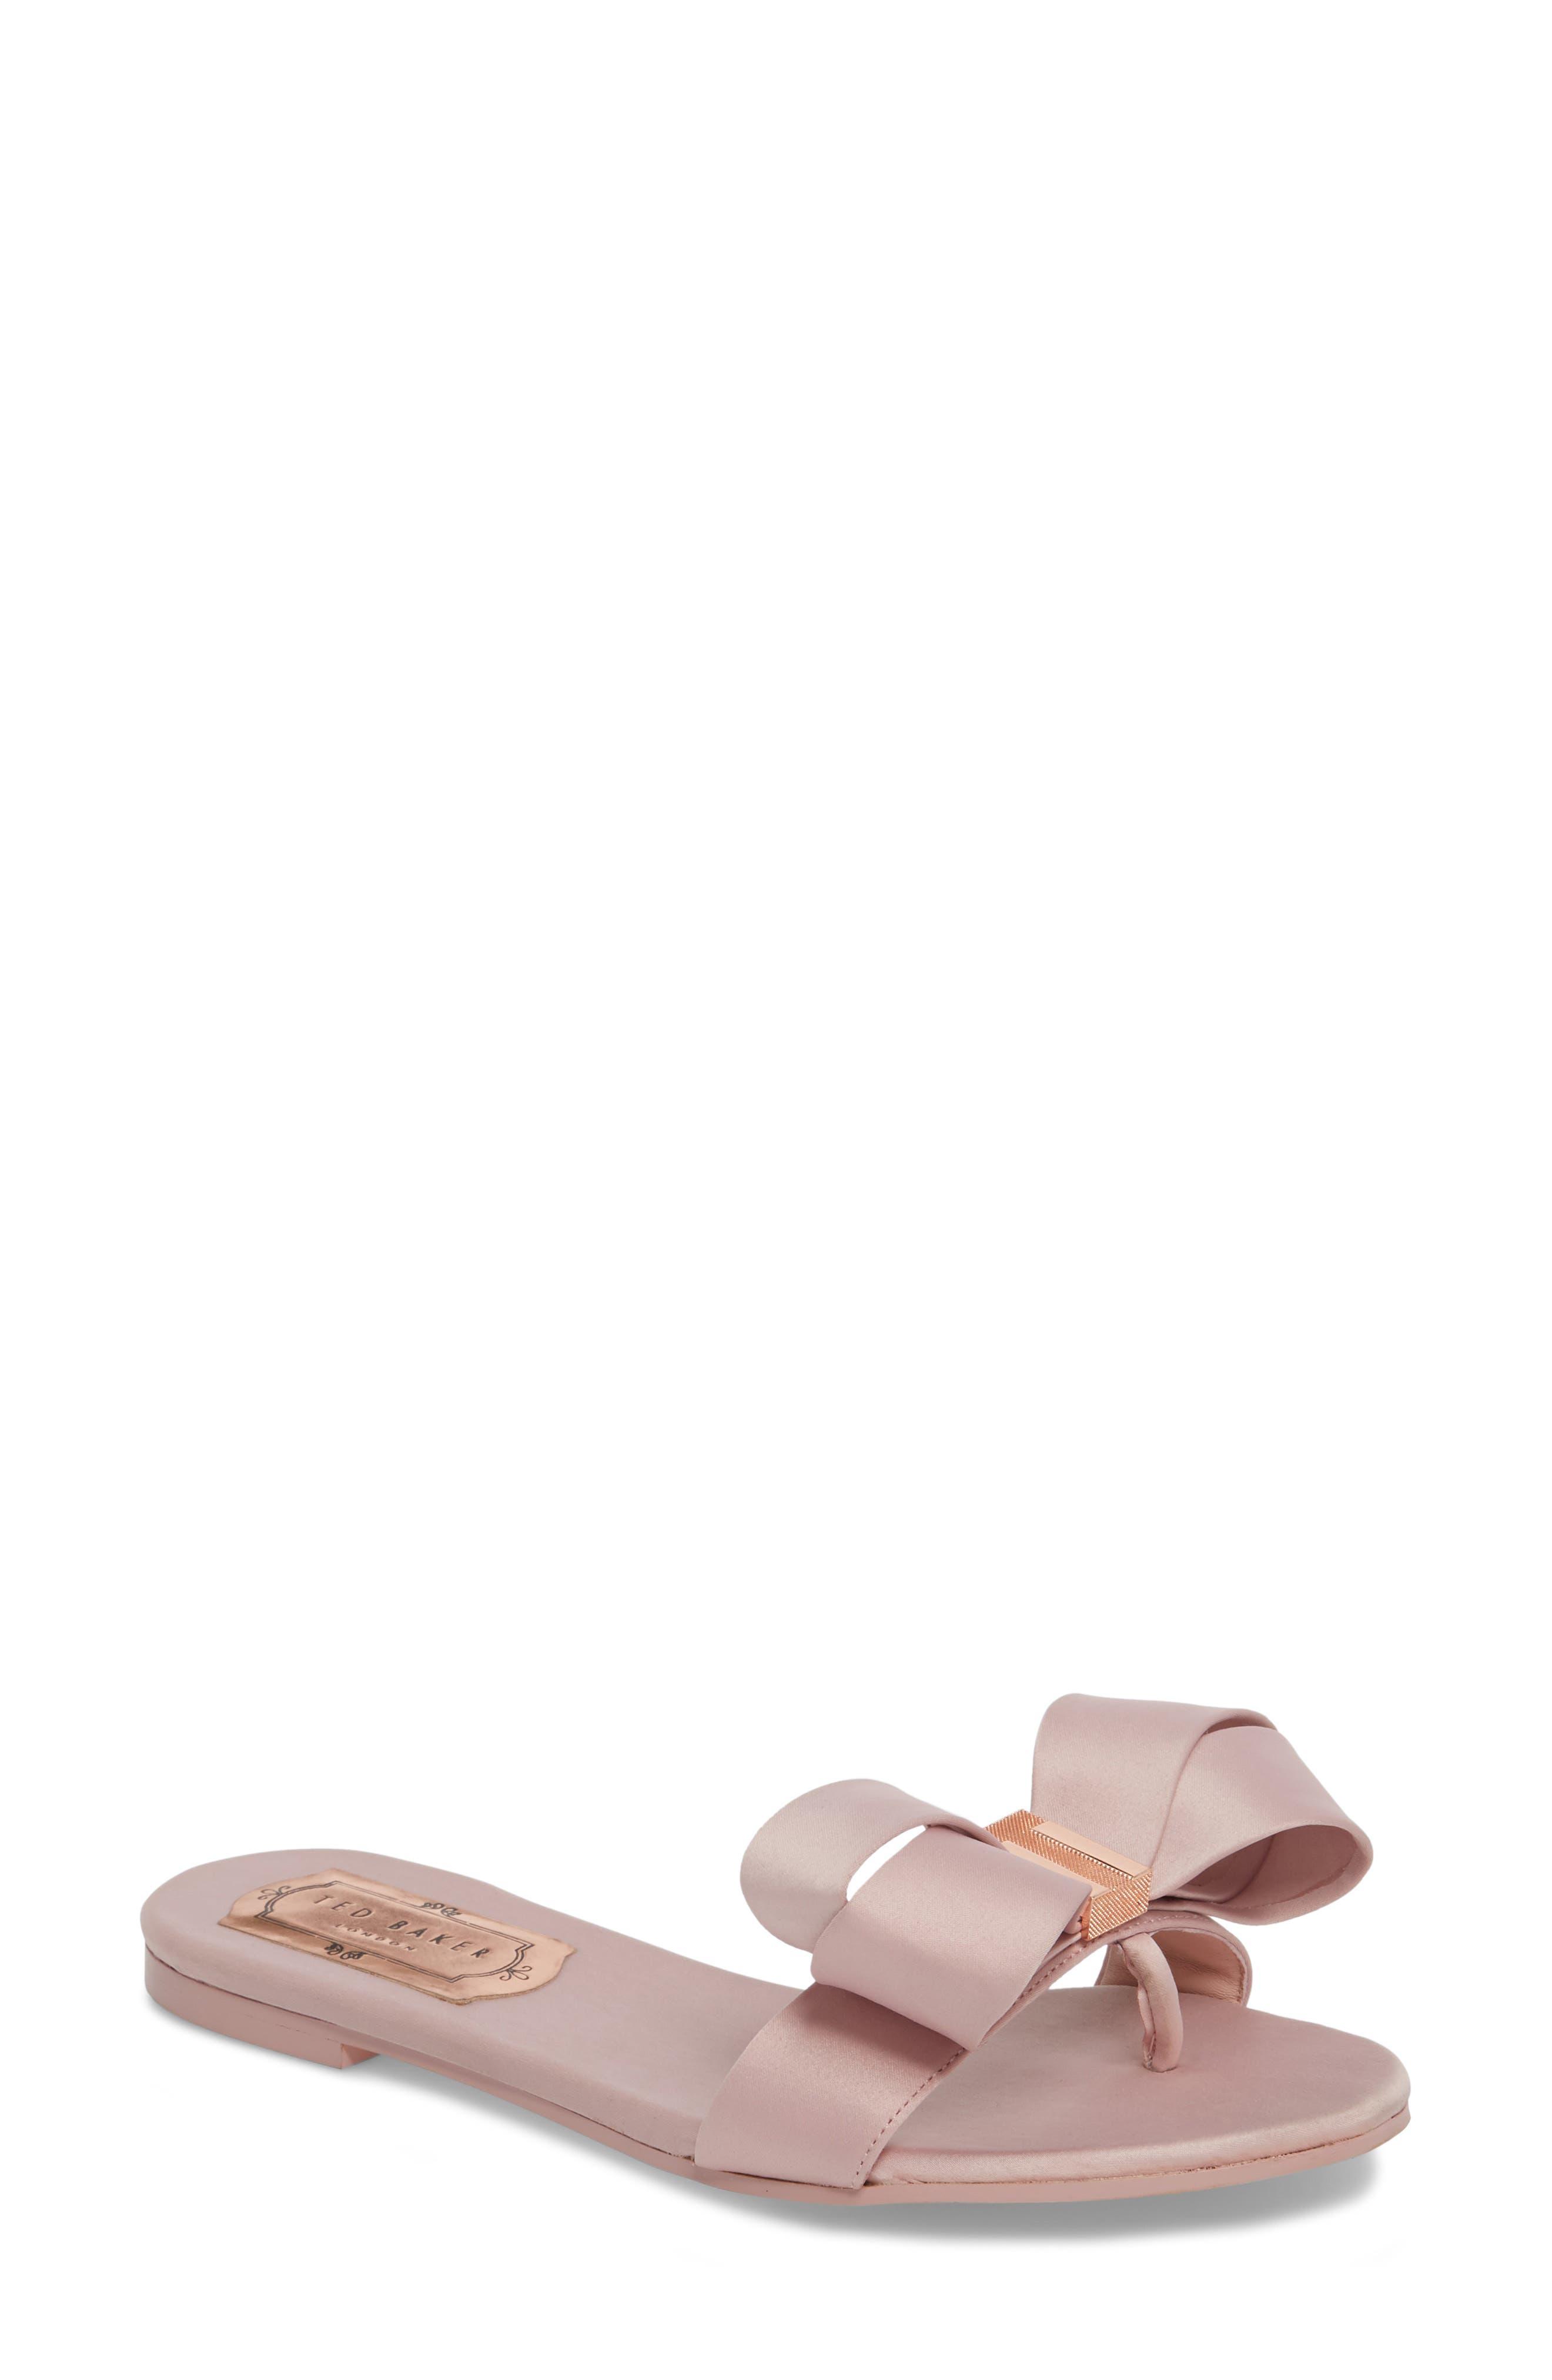 Slide Sandal,                             Main thumbnail 1, color,                             Light Pink Satin